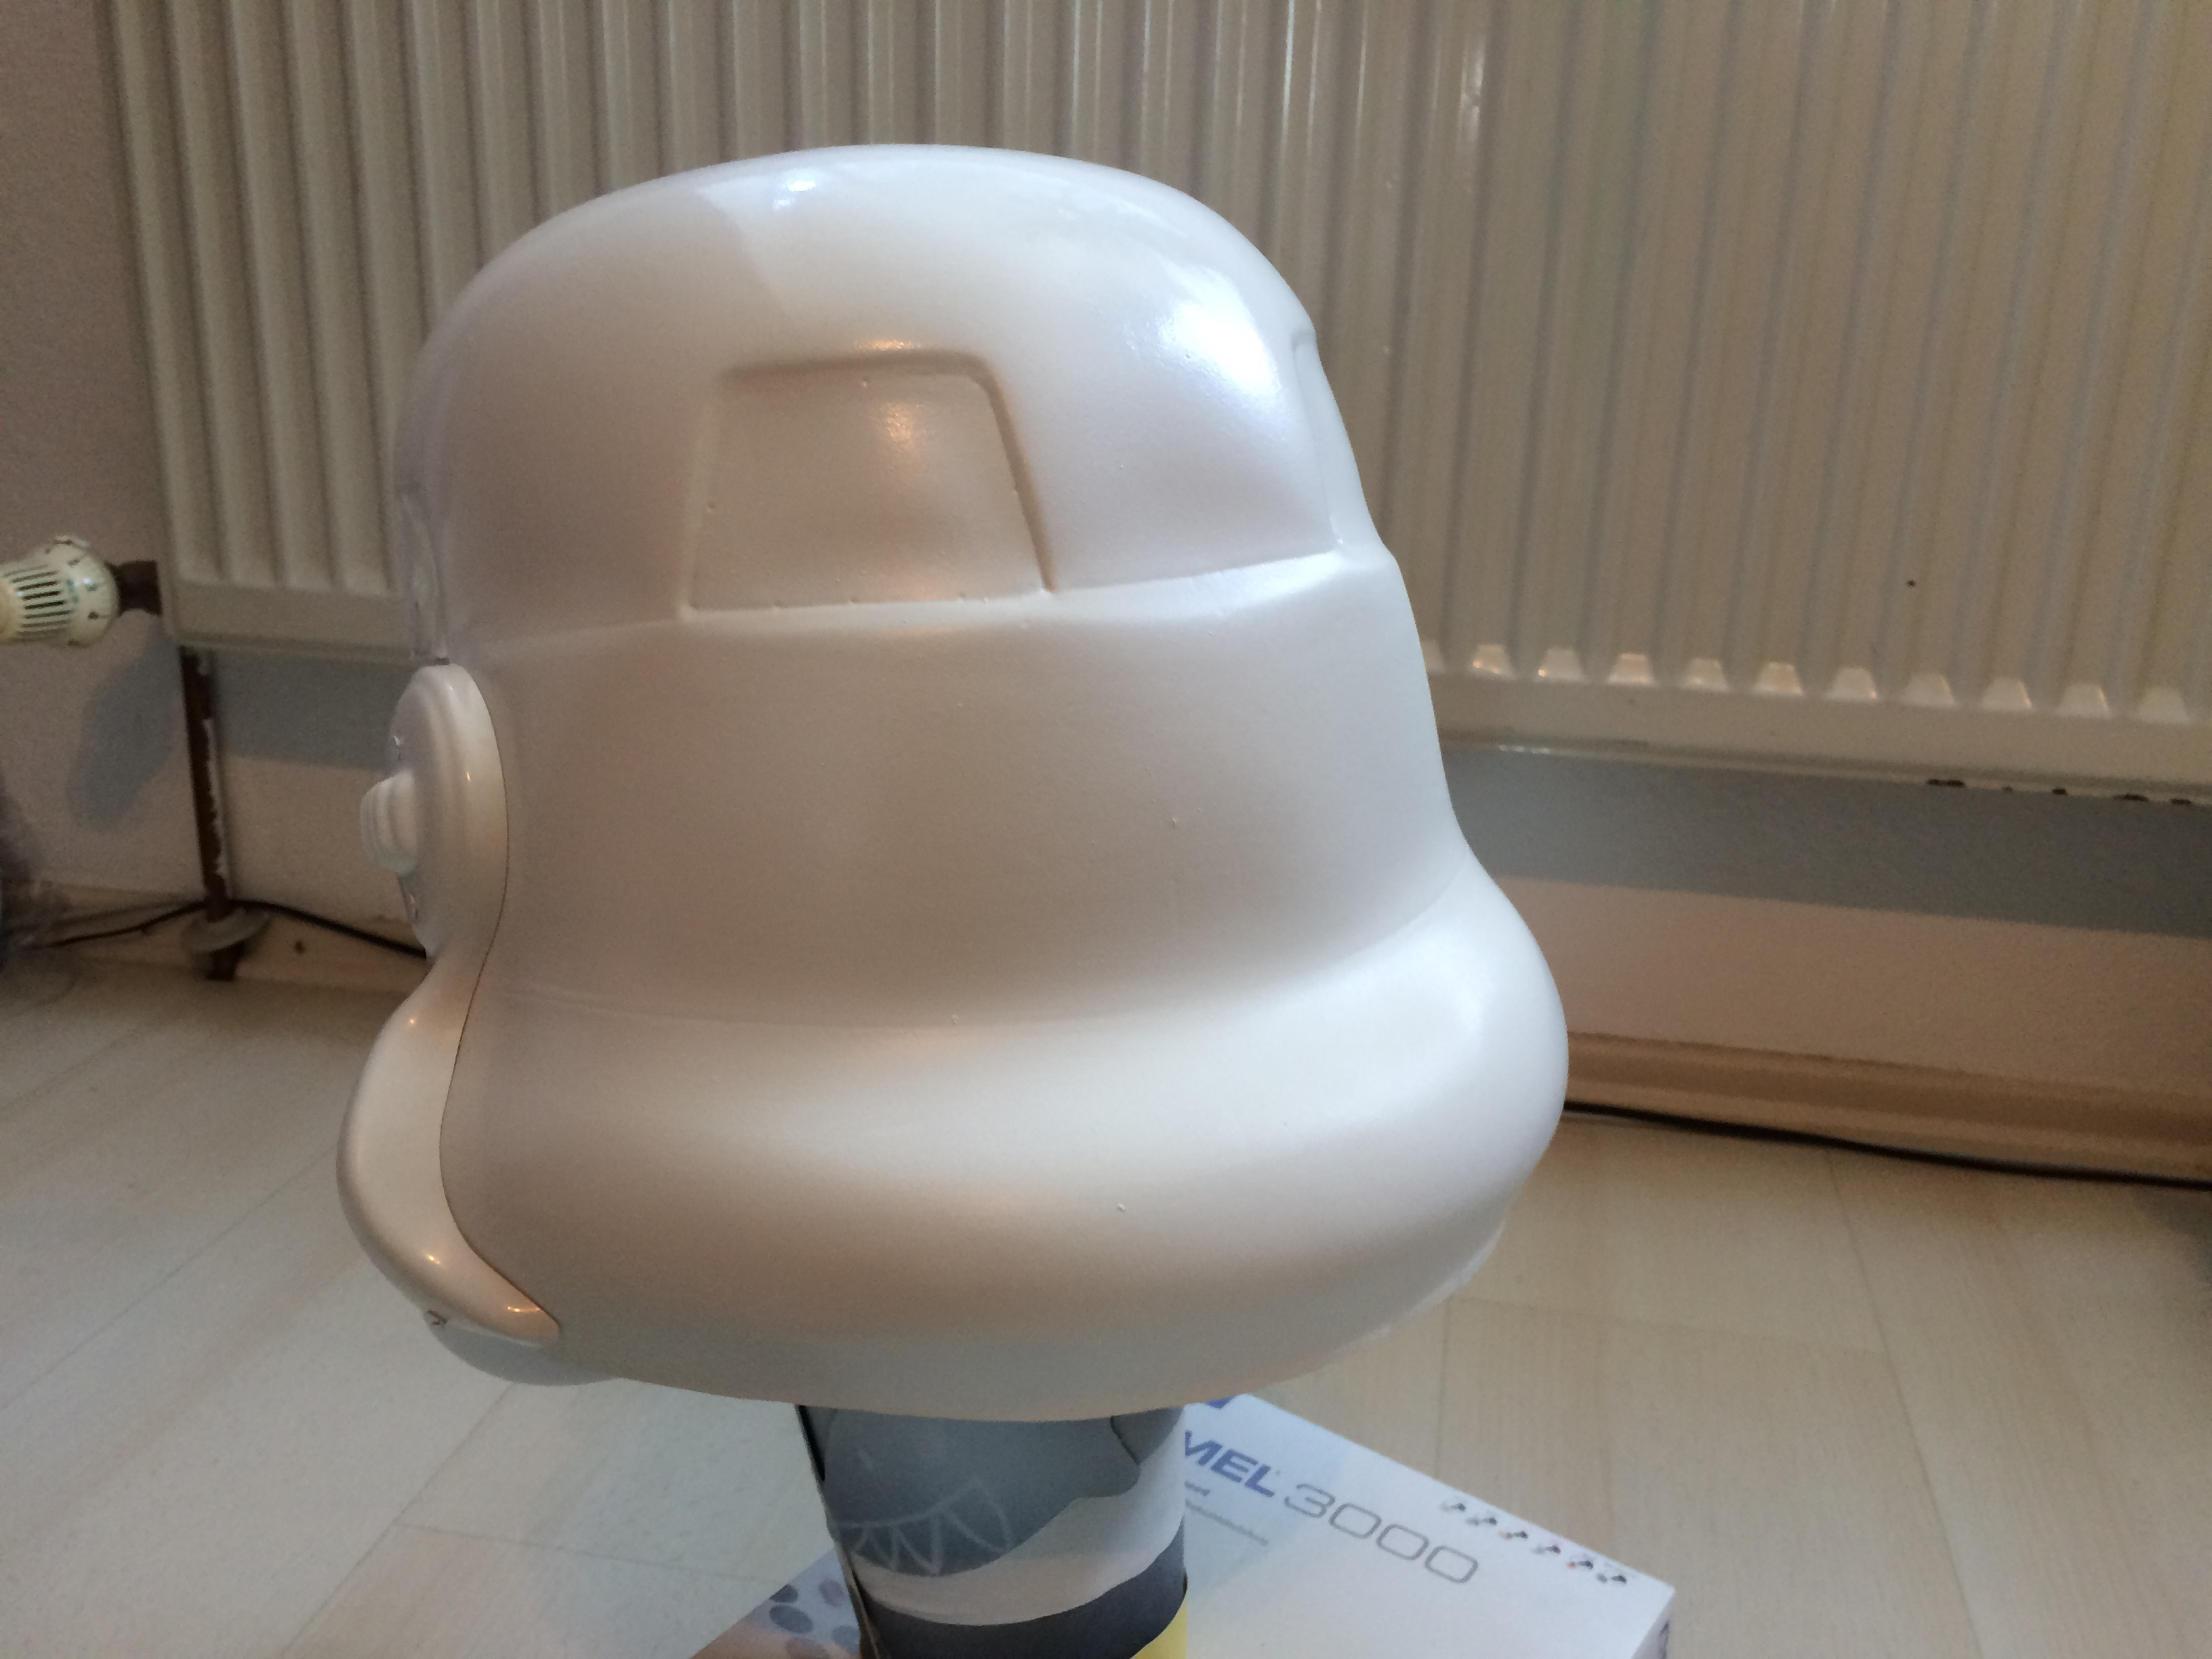 www.bartmarke.net/501st/WIP/FISD/Helmet/HDPE/PaintedBack.JPG